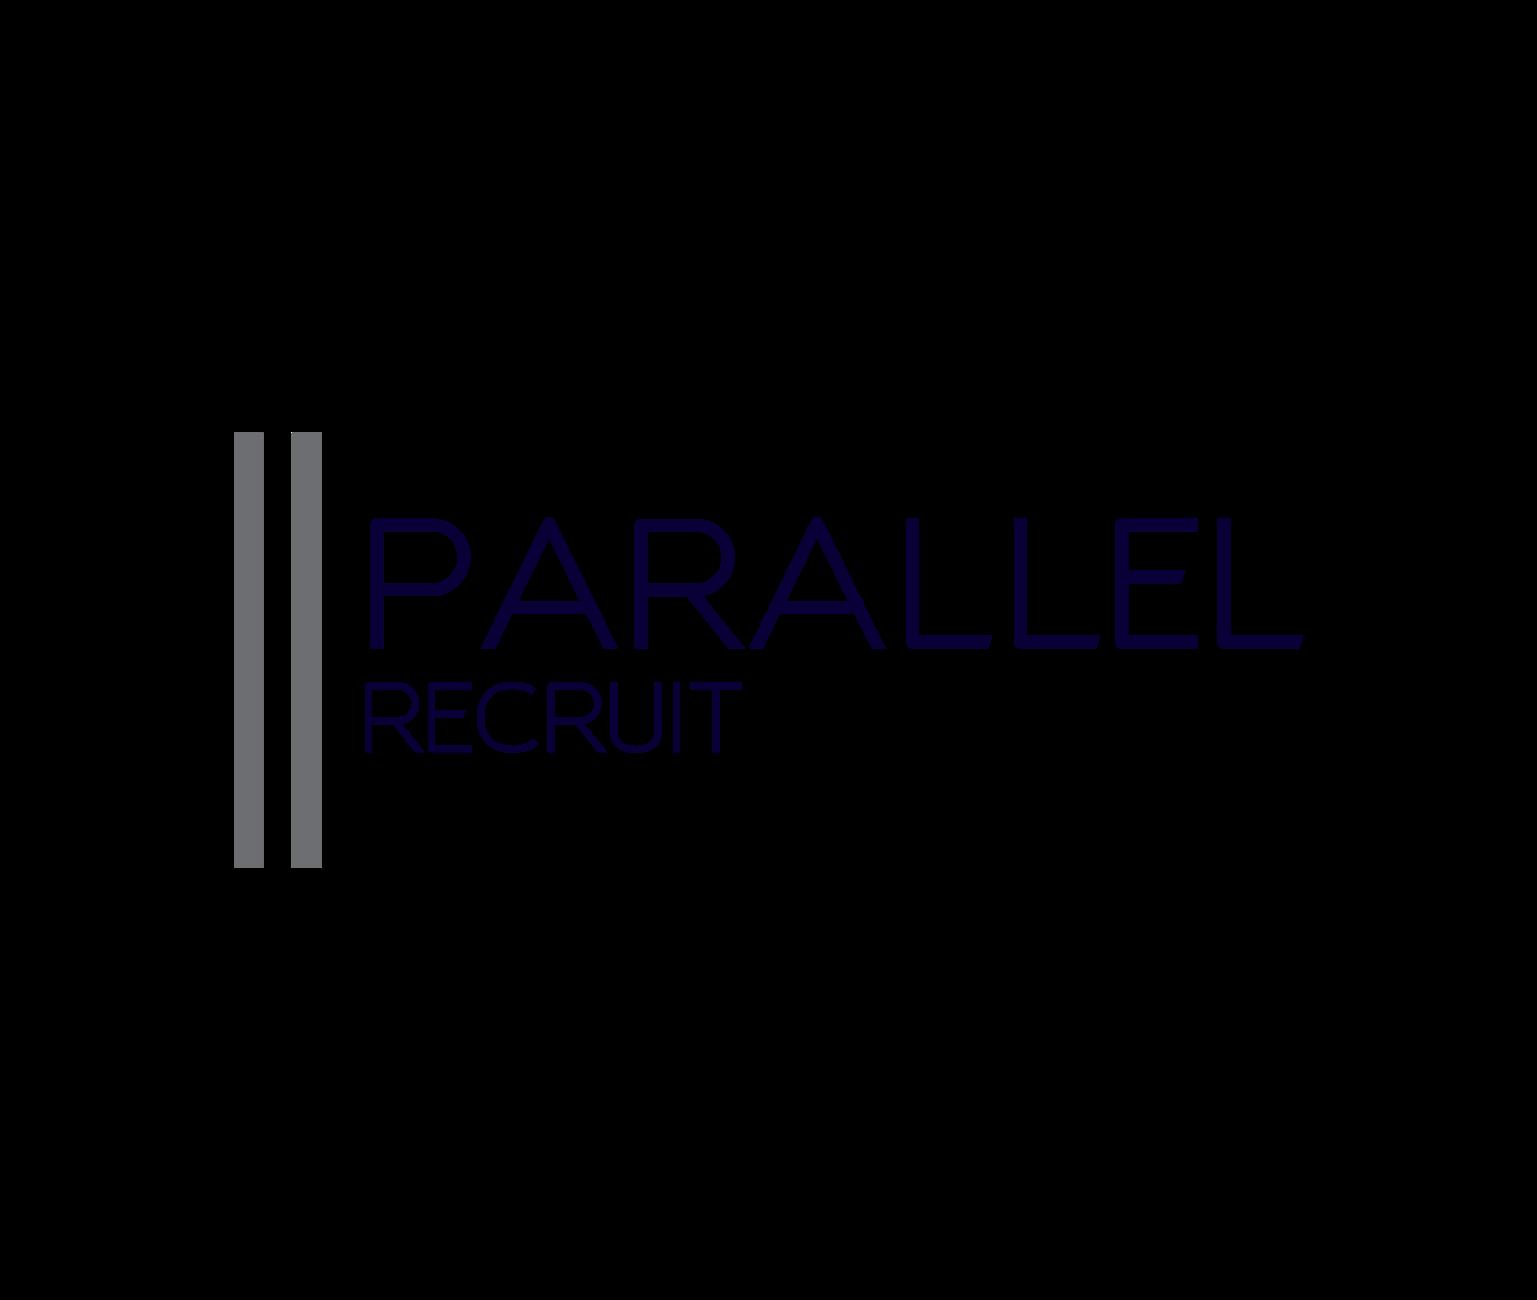 www.parallelrecruit.co.uk